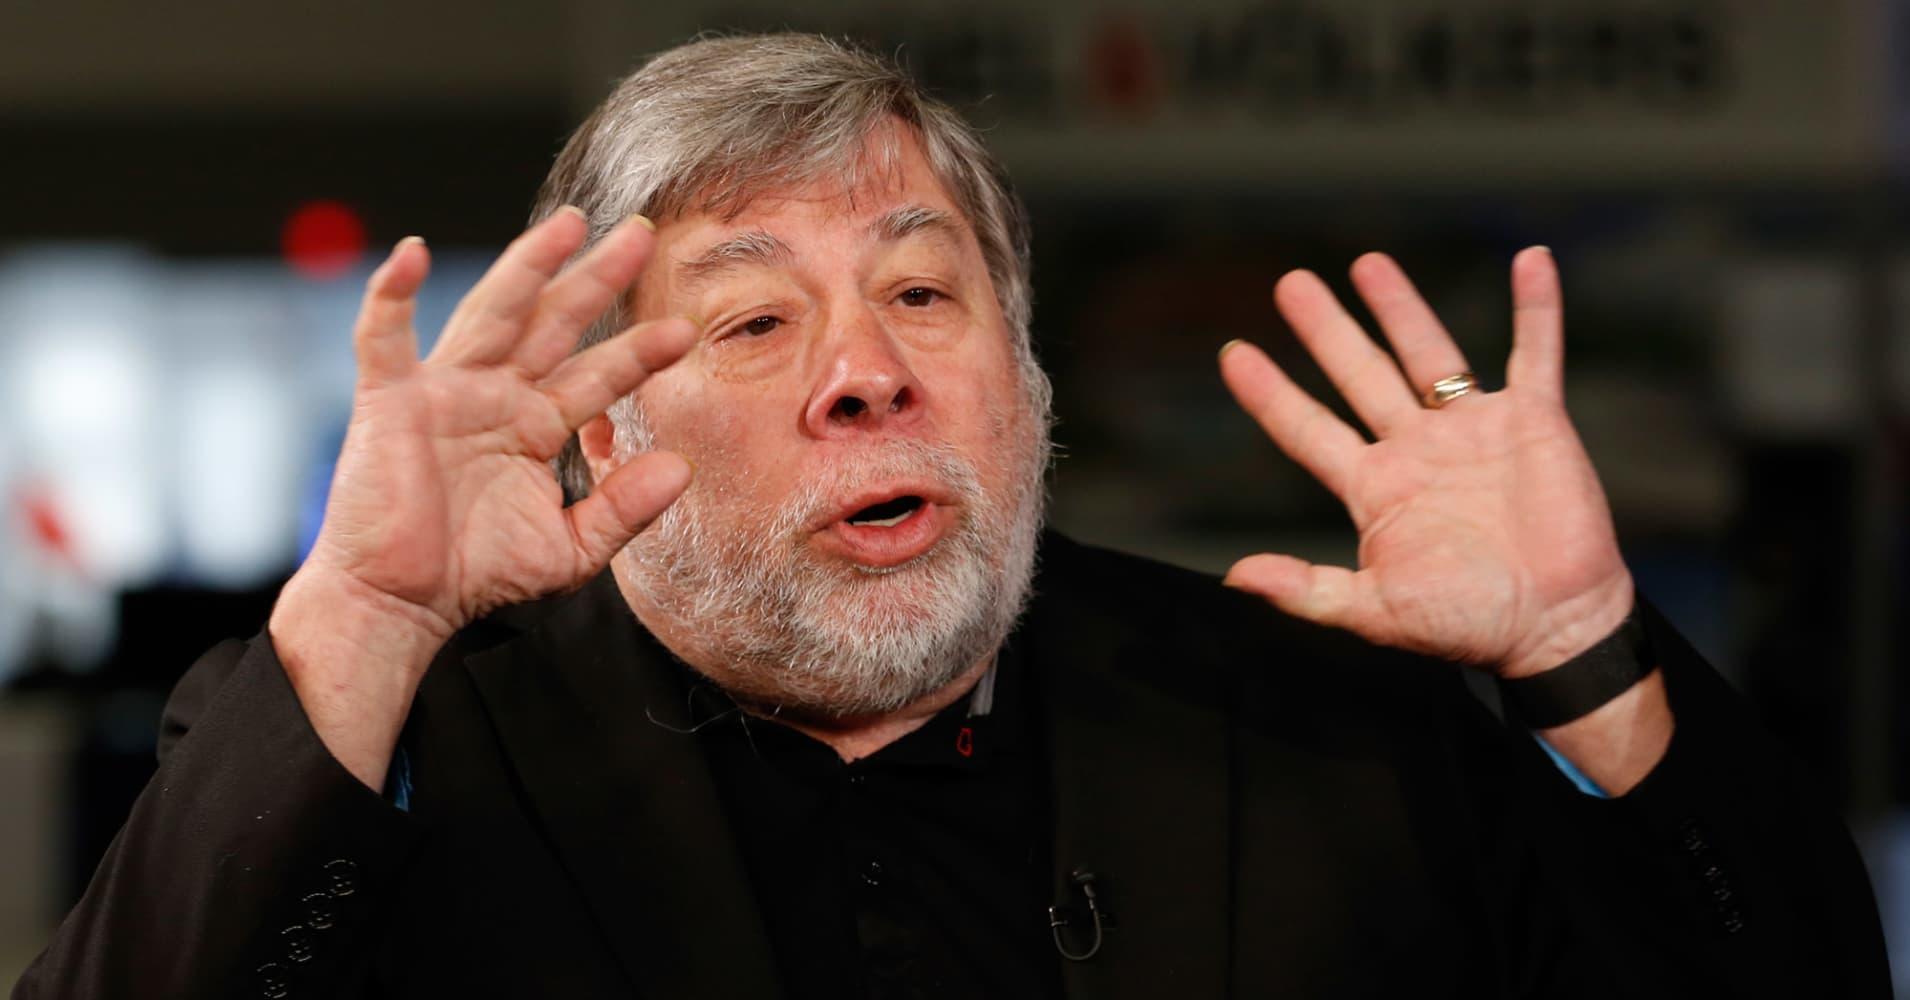 Steve Wozniak speaking at eMerge in Miami on June 12, 2017.